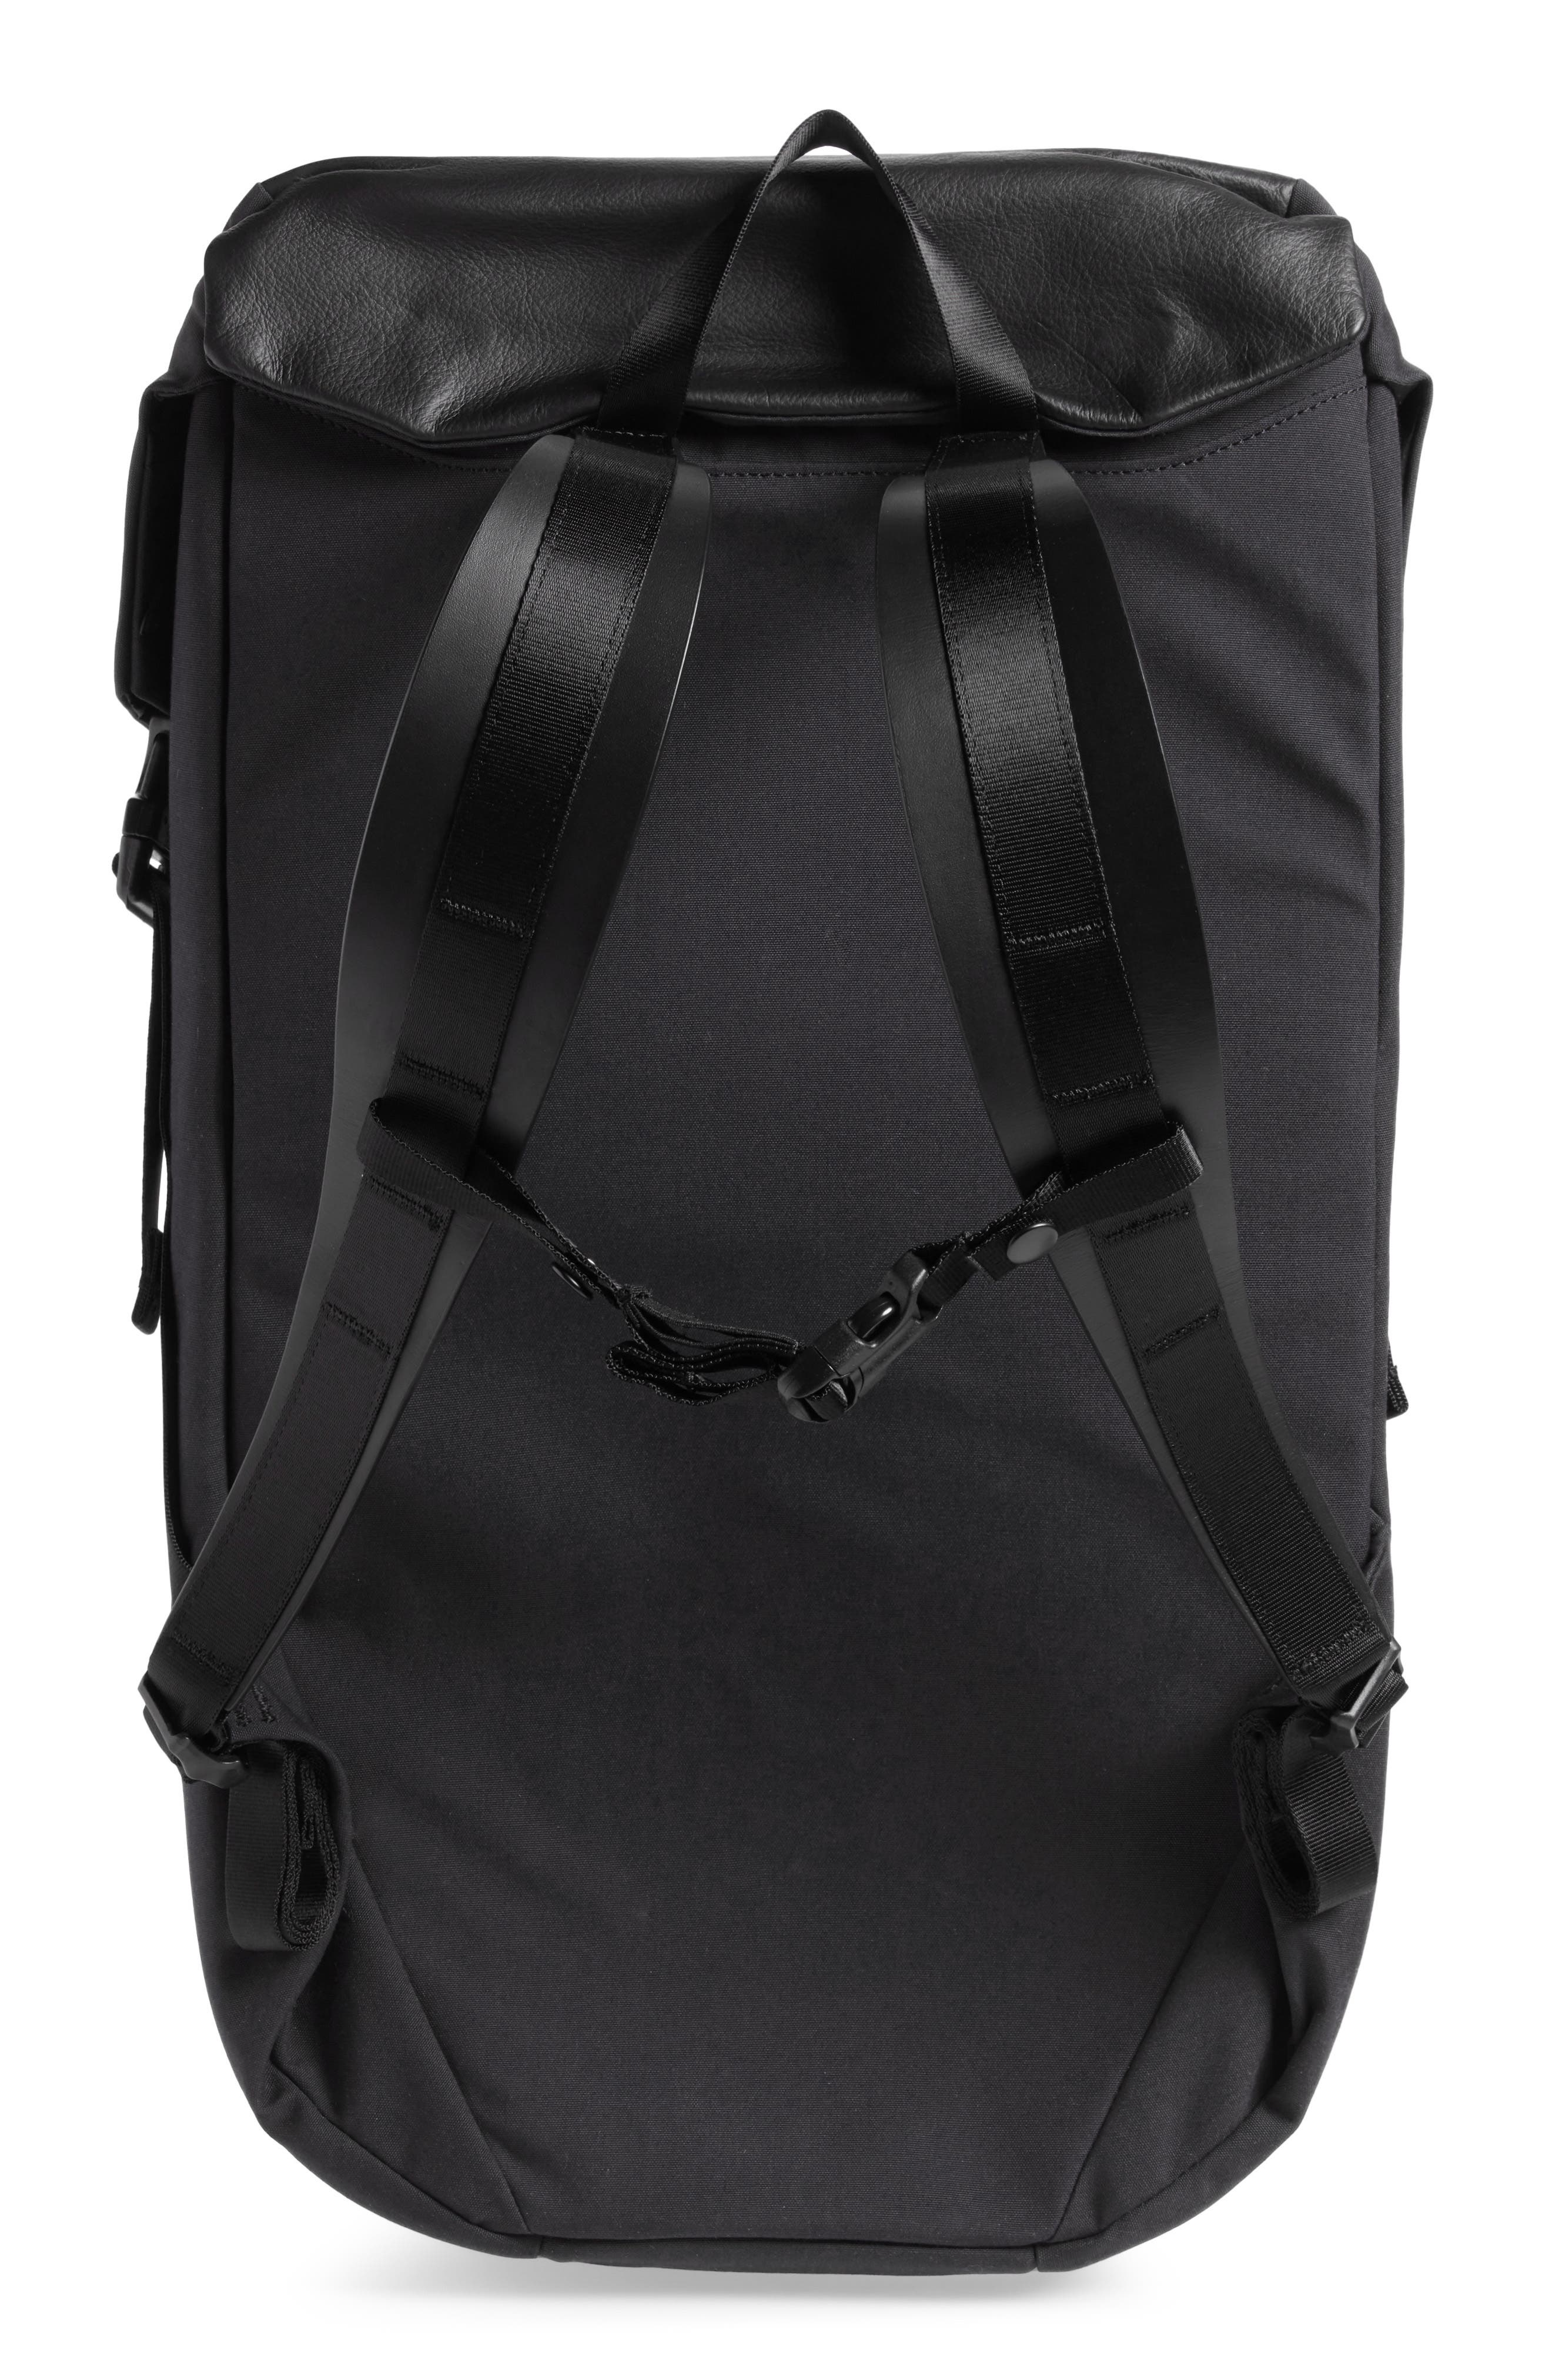 Locker Pack Lux Backpack,                             Alternate thumbnail 3, color,                             001